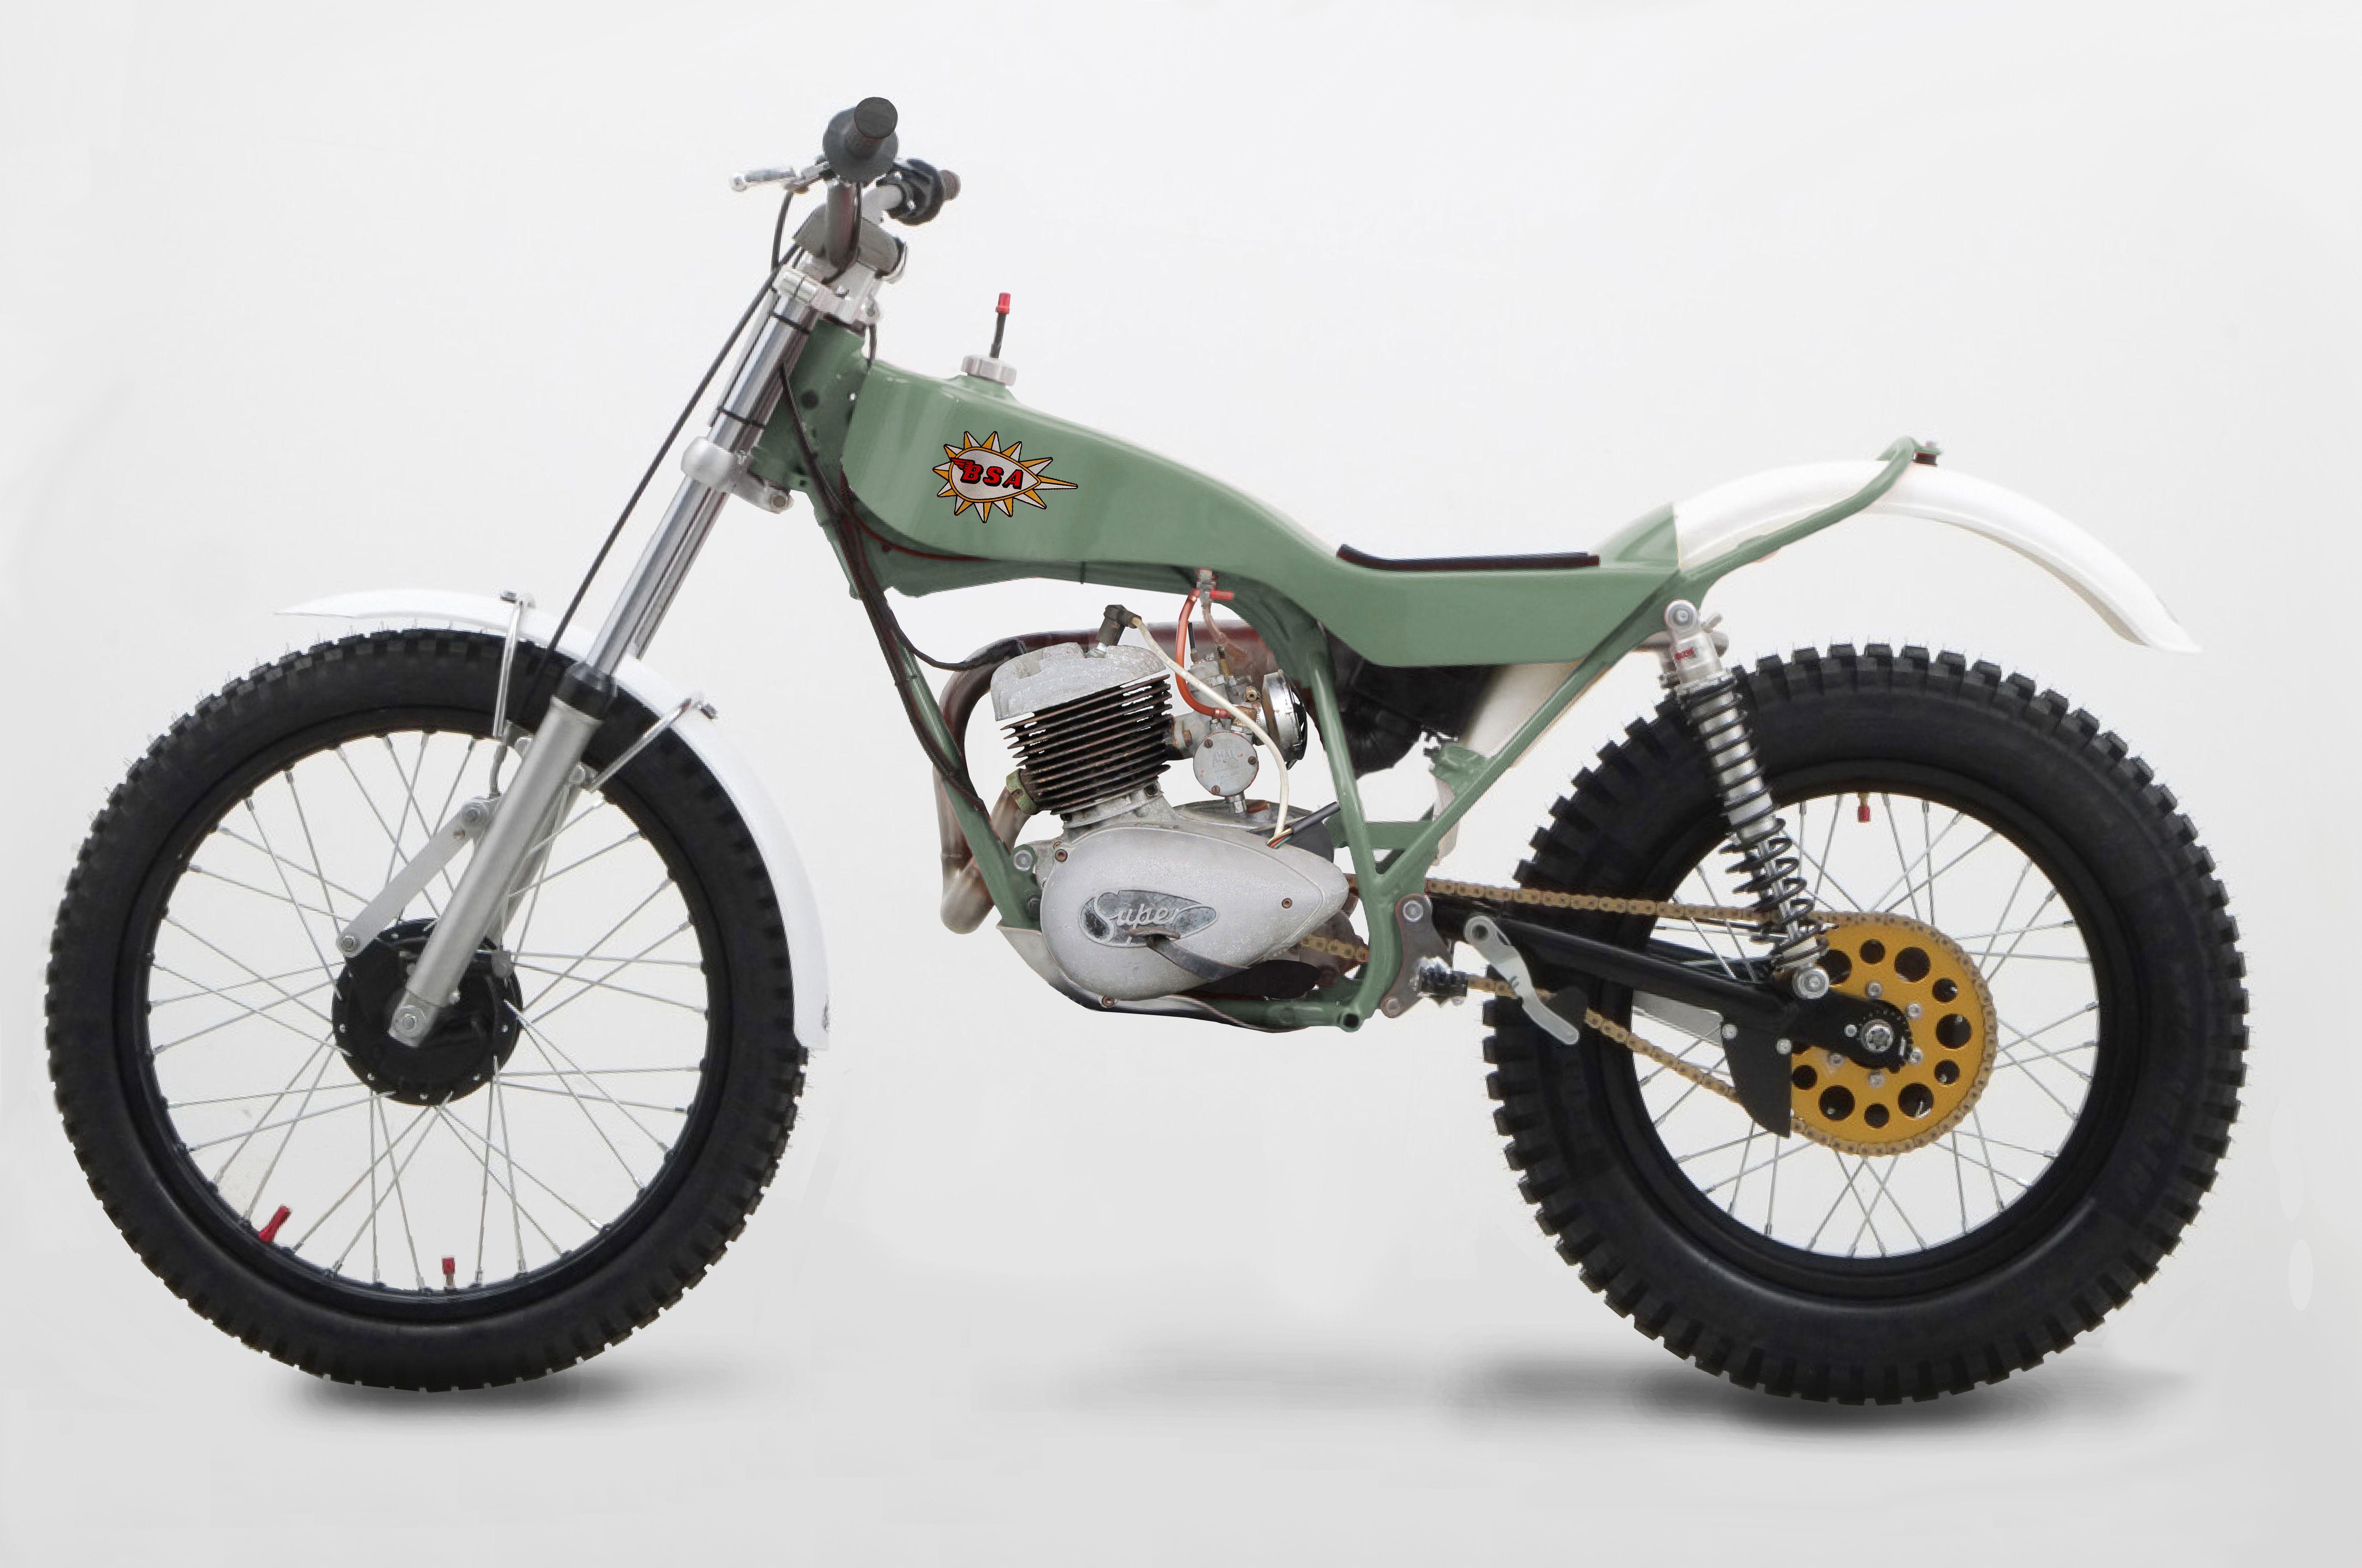 Bsa bantam 175 x yamaha ty bike pinterest trials for Yamaha trials bike